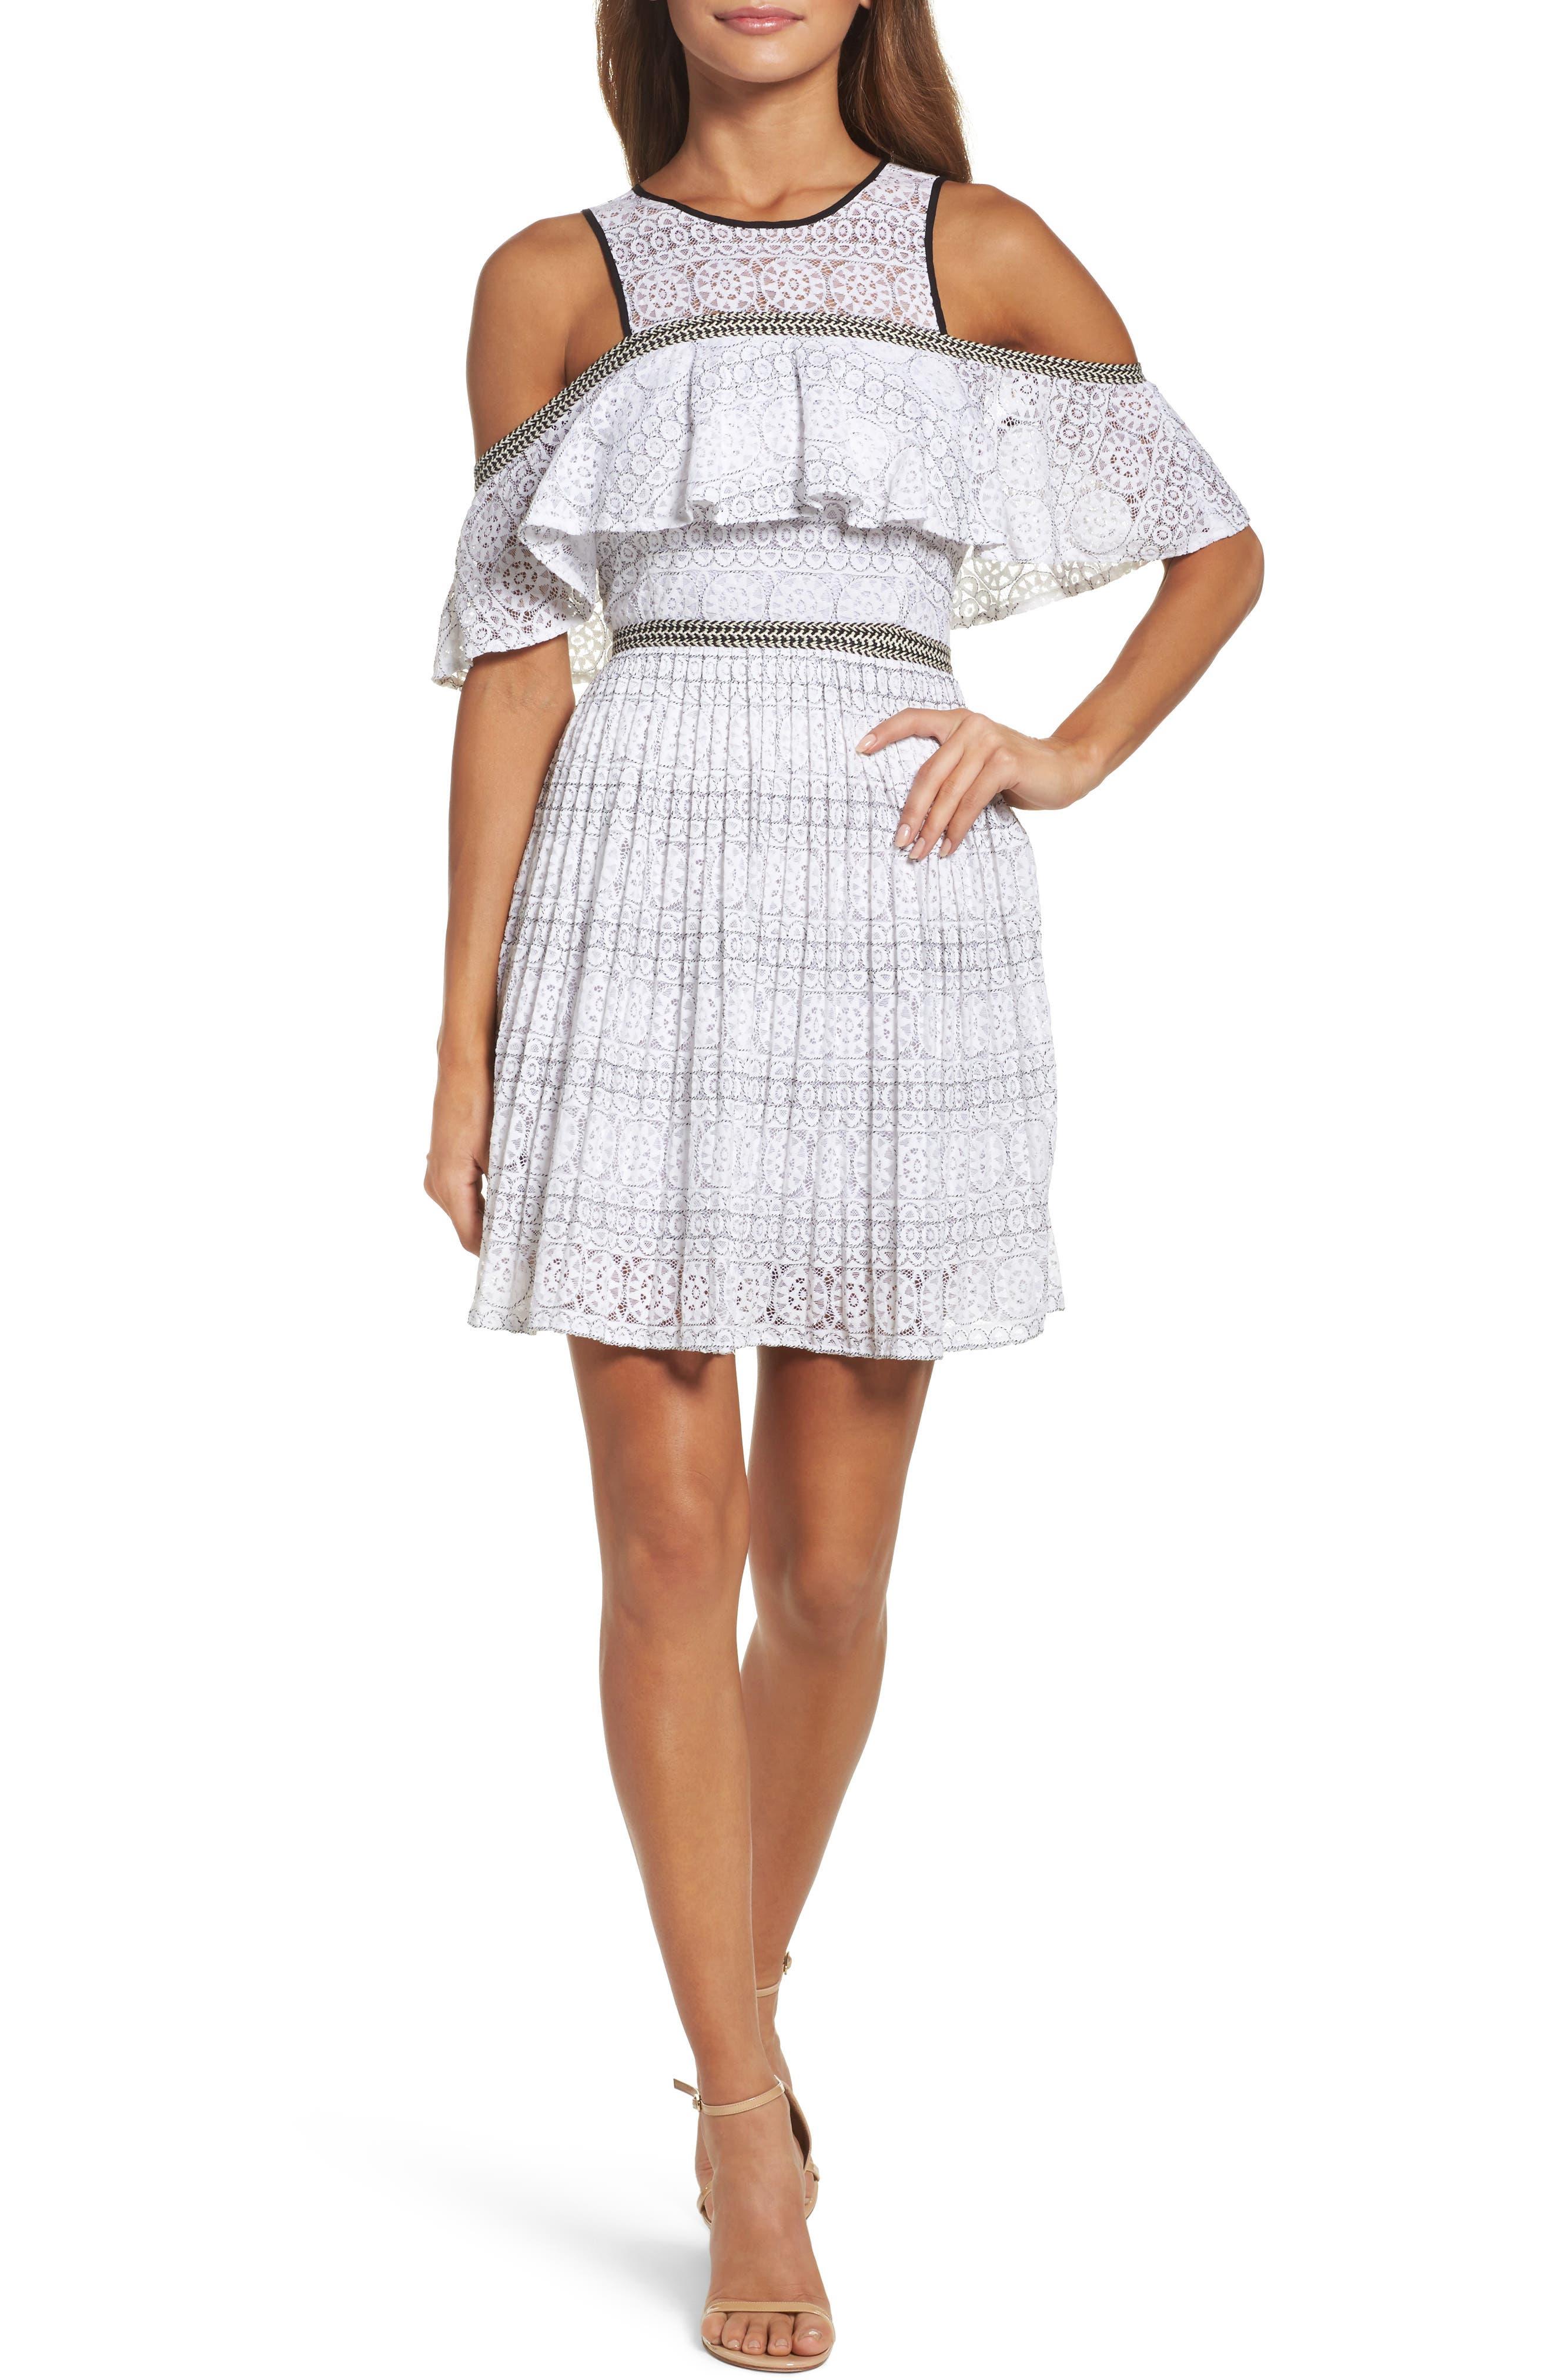 Alternate Image 1 Selected - Foxiedox Belinda Lace Cold Shoulder Dress